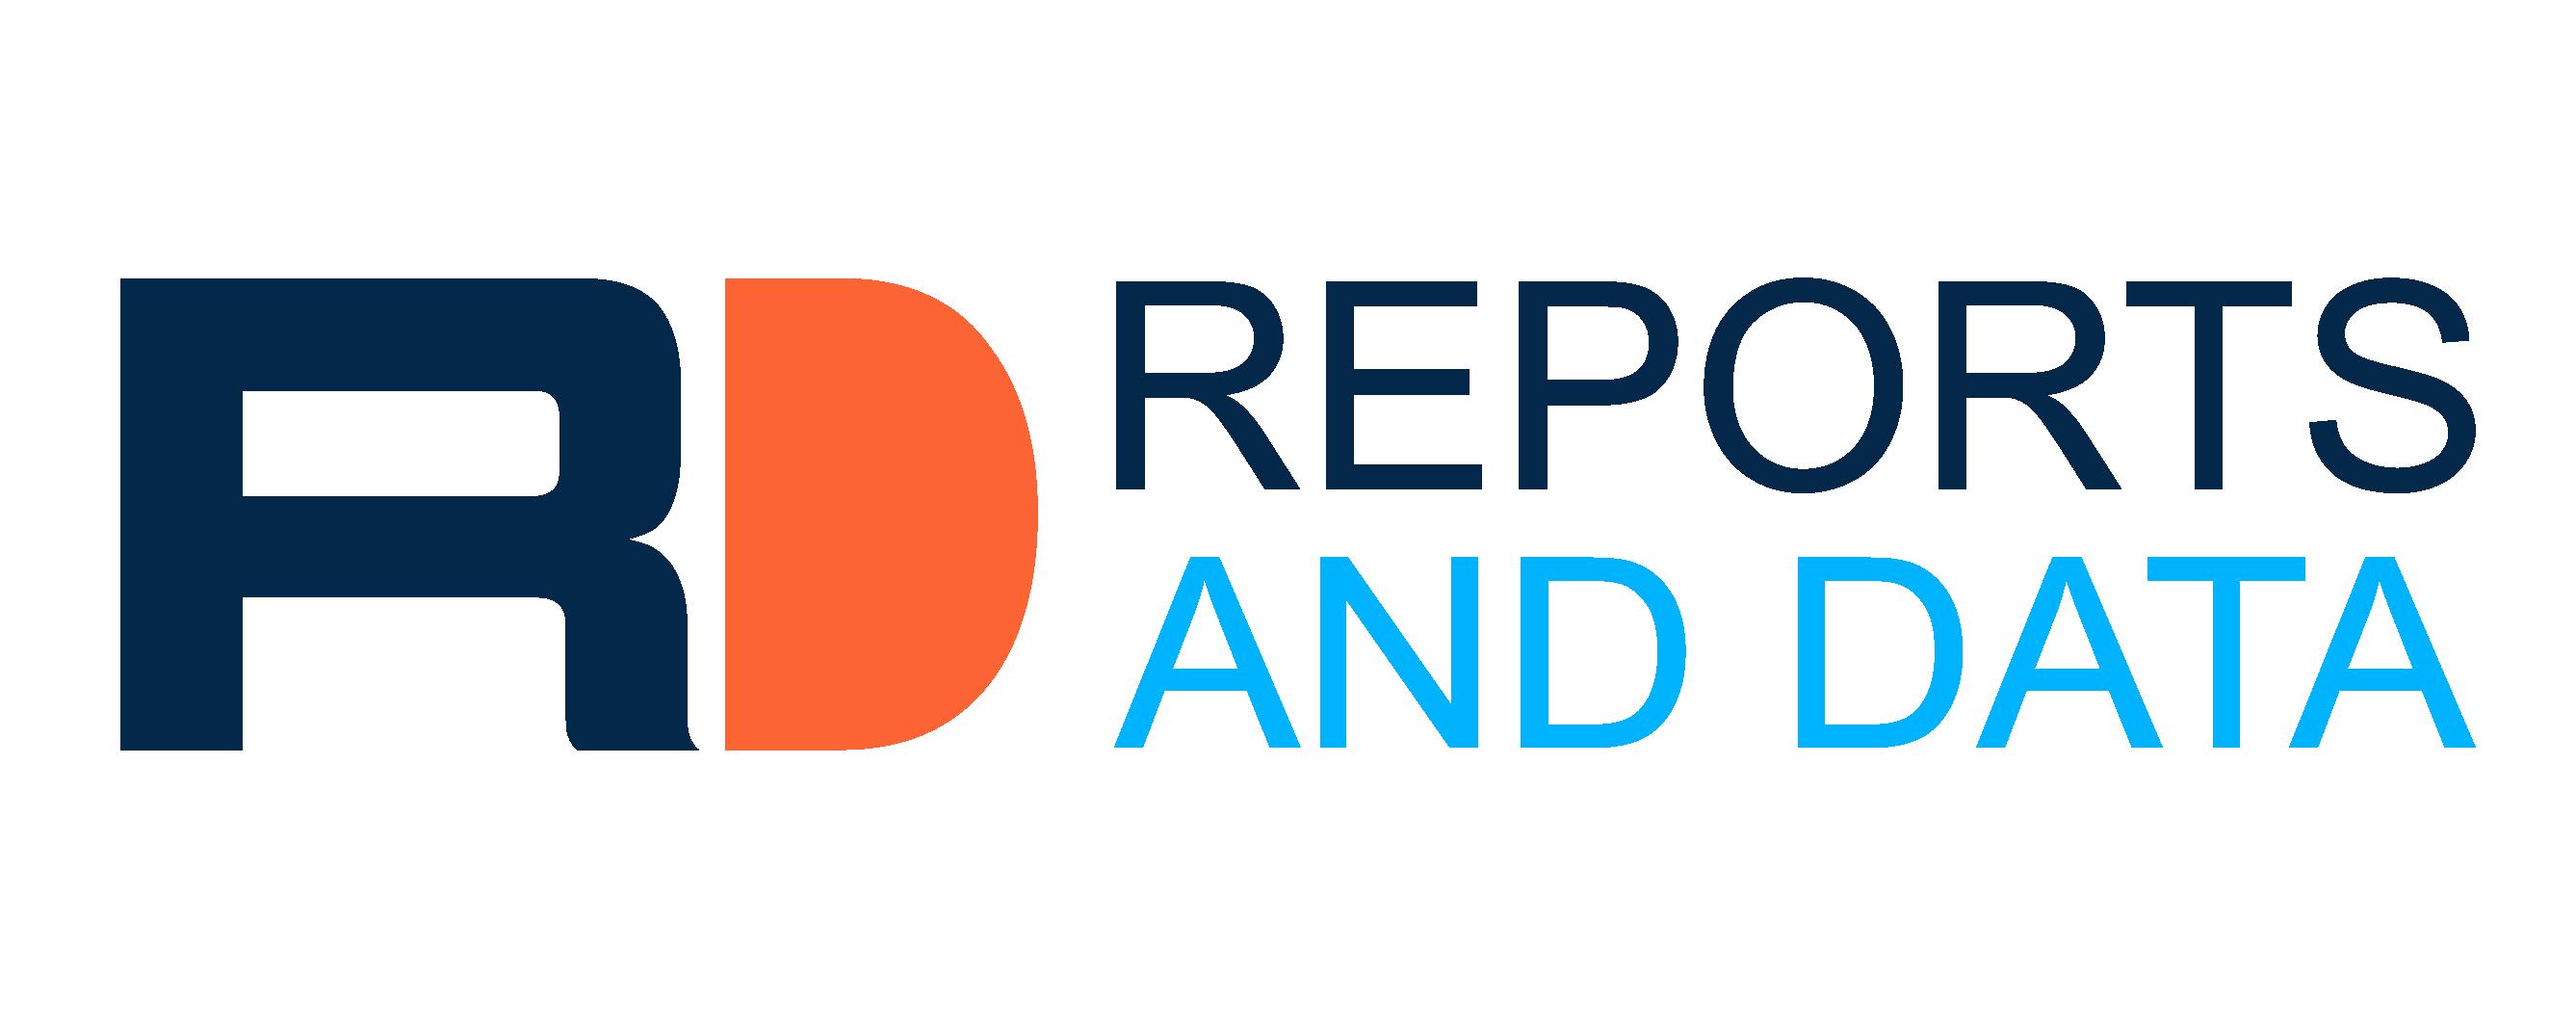 Plastic Pigments Market 2019, Industry Outlook, Revenue and Forecast By 2026: Top Vendors- BASF SE, Clariant, Dic Corporation, Cabot Corporation, Ferro Corporation, Tronox, Heubach